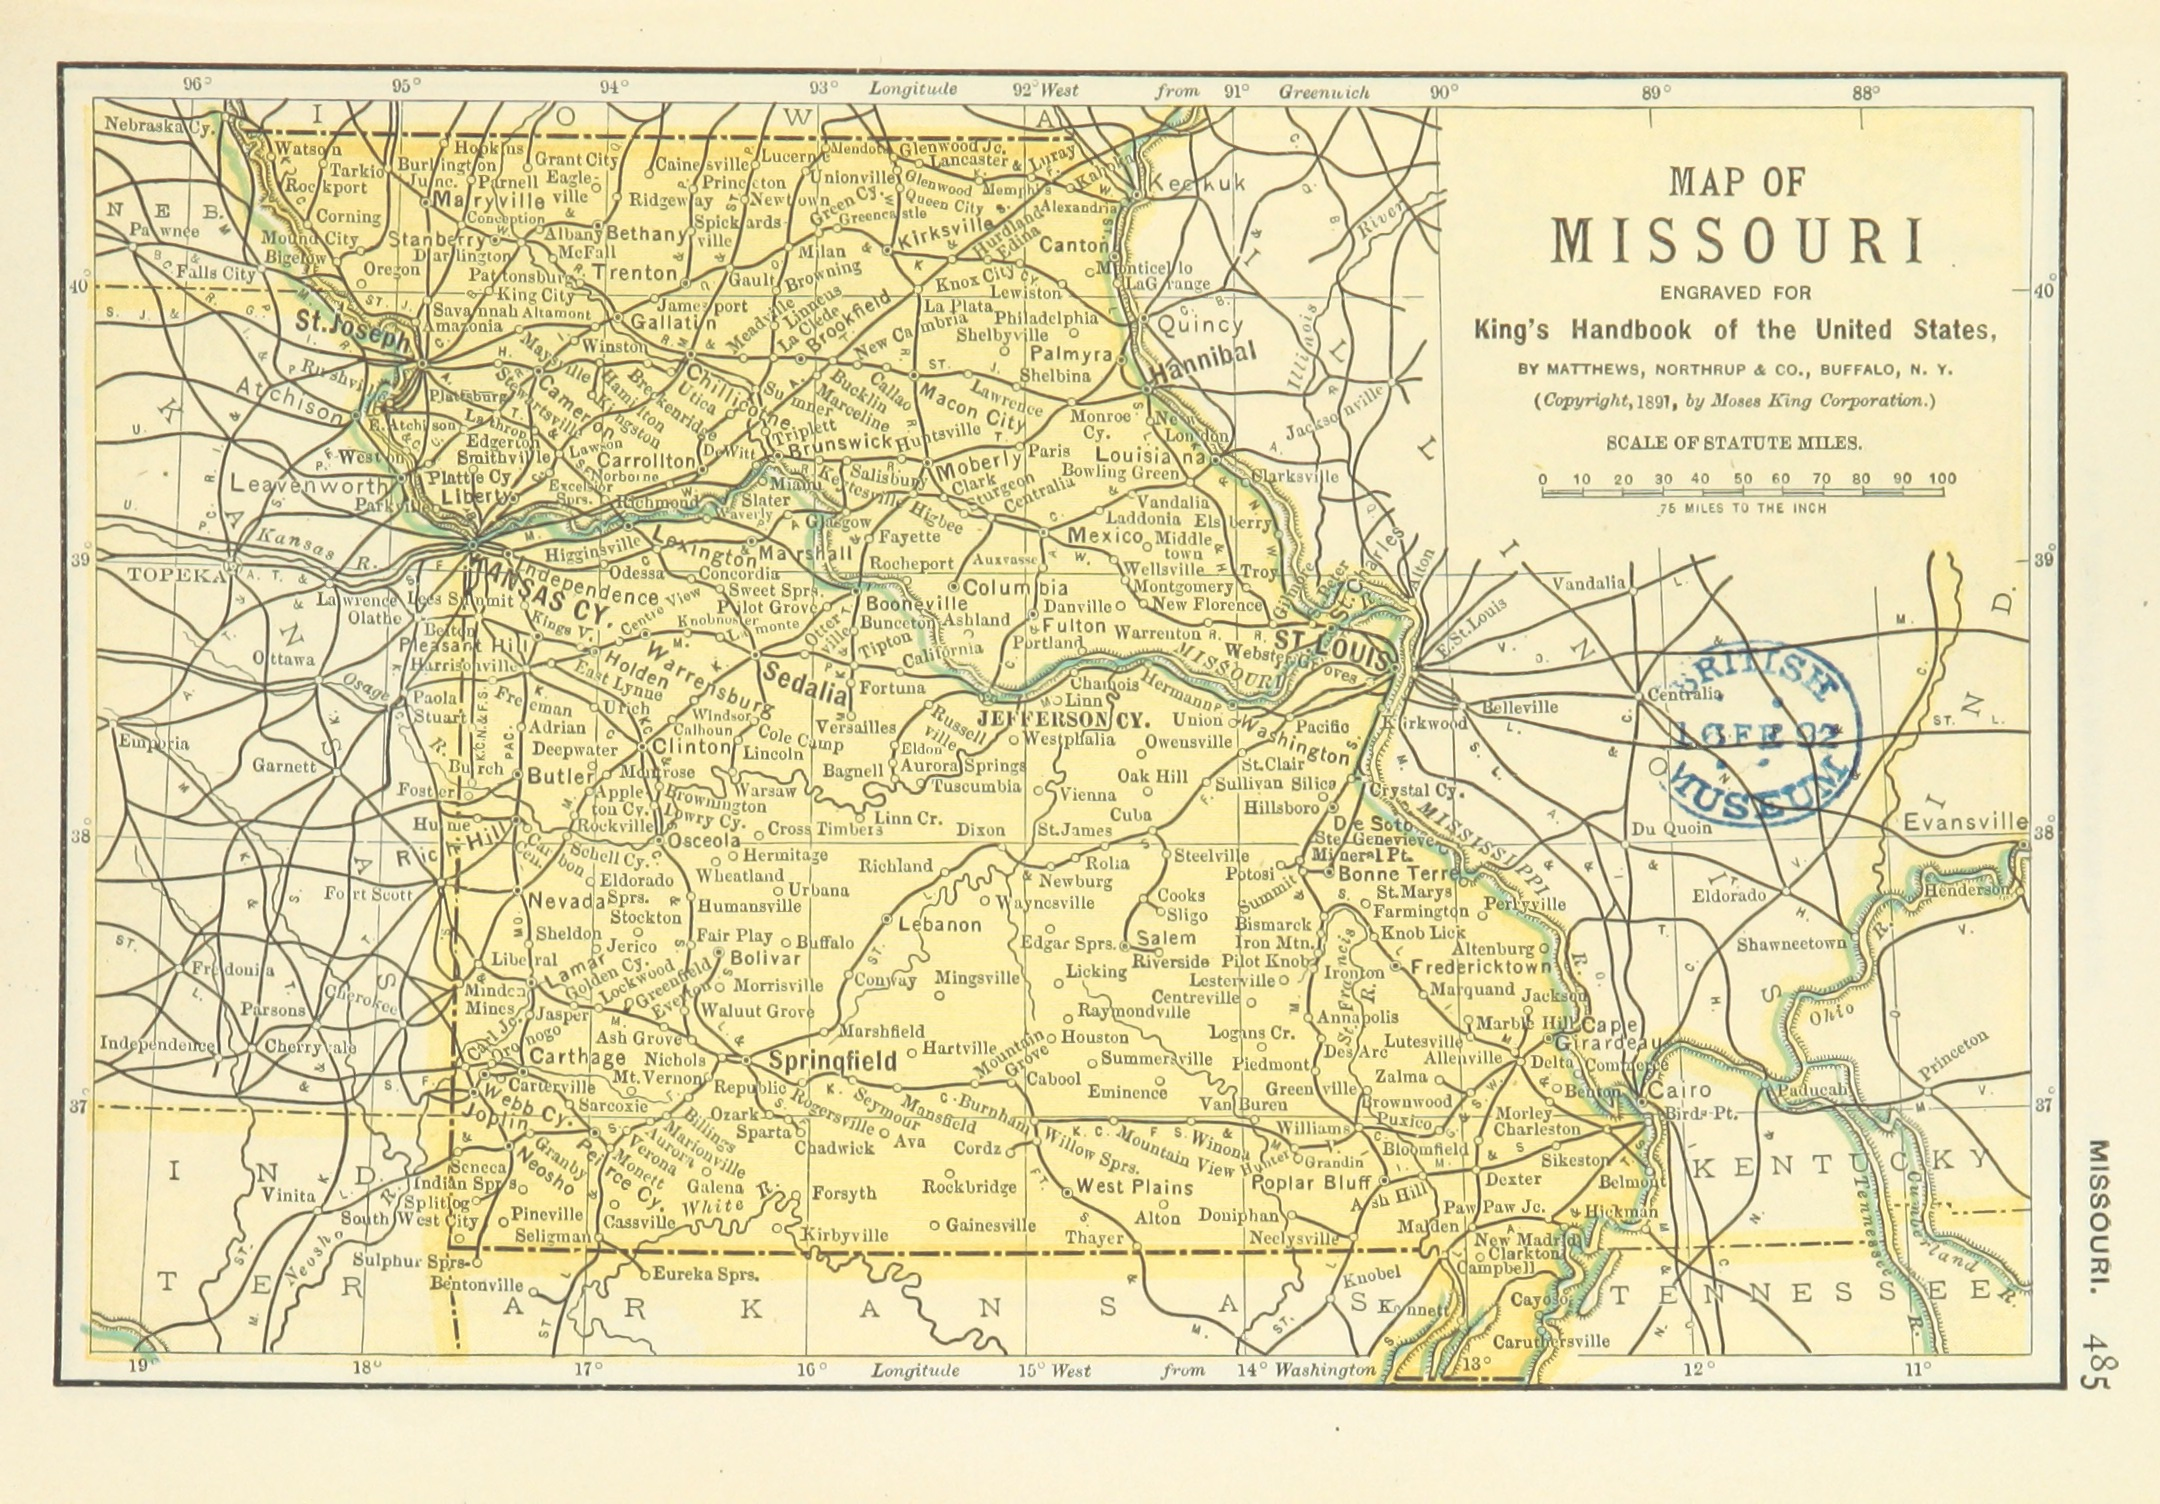 FileUSMAPS P MAP OF MISSOURIjpg Wikimedia Commons - Missouri on a us map